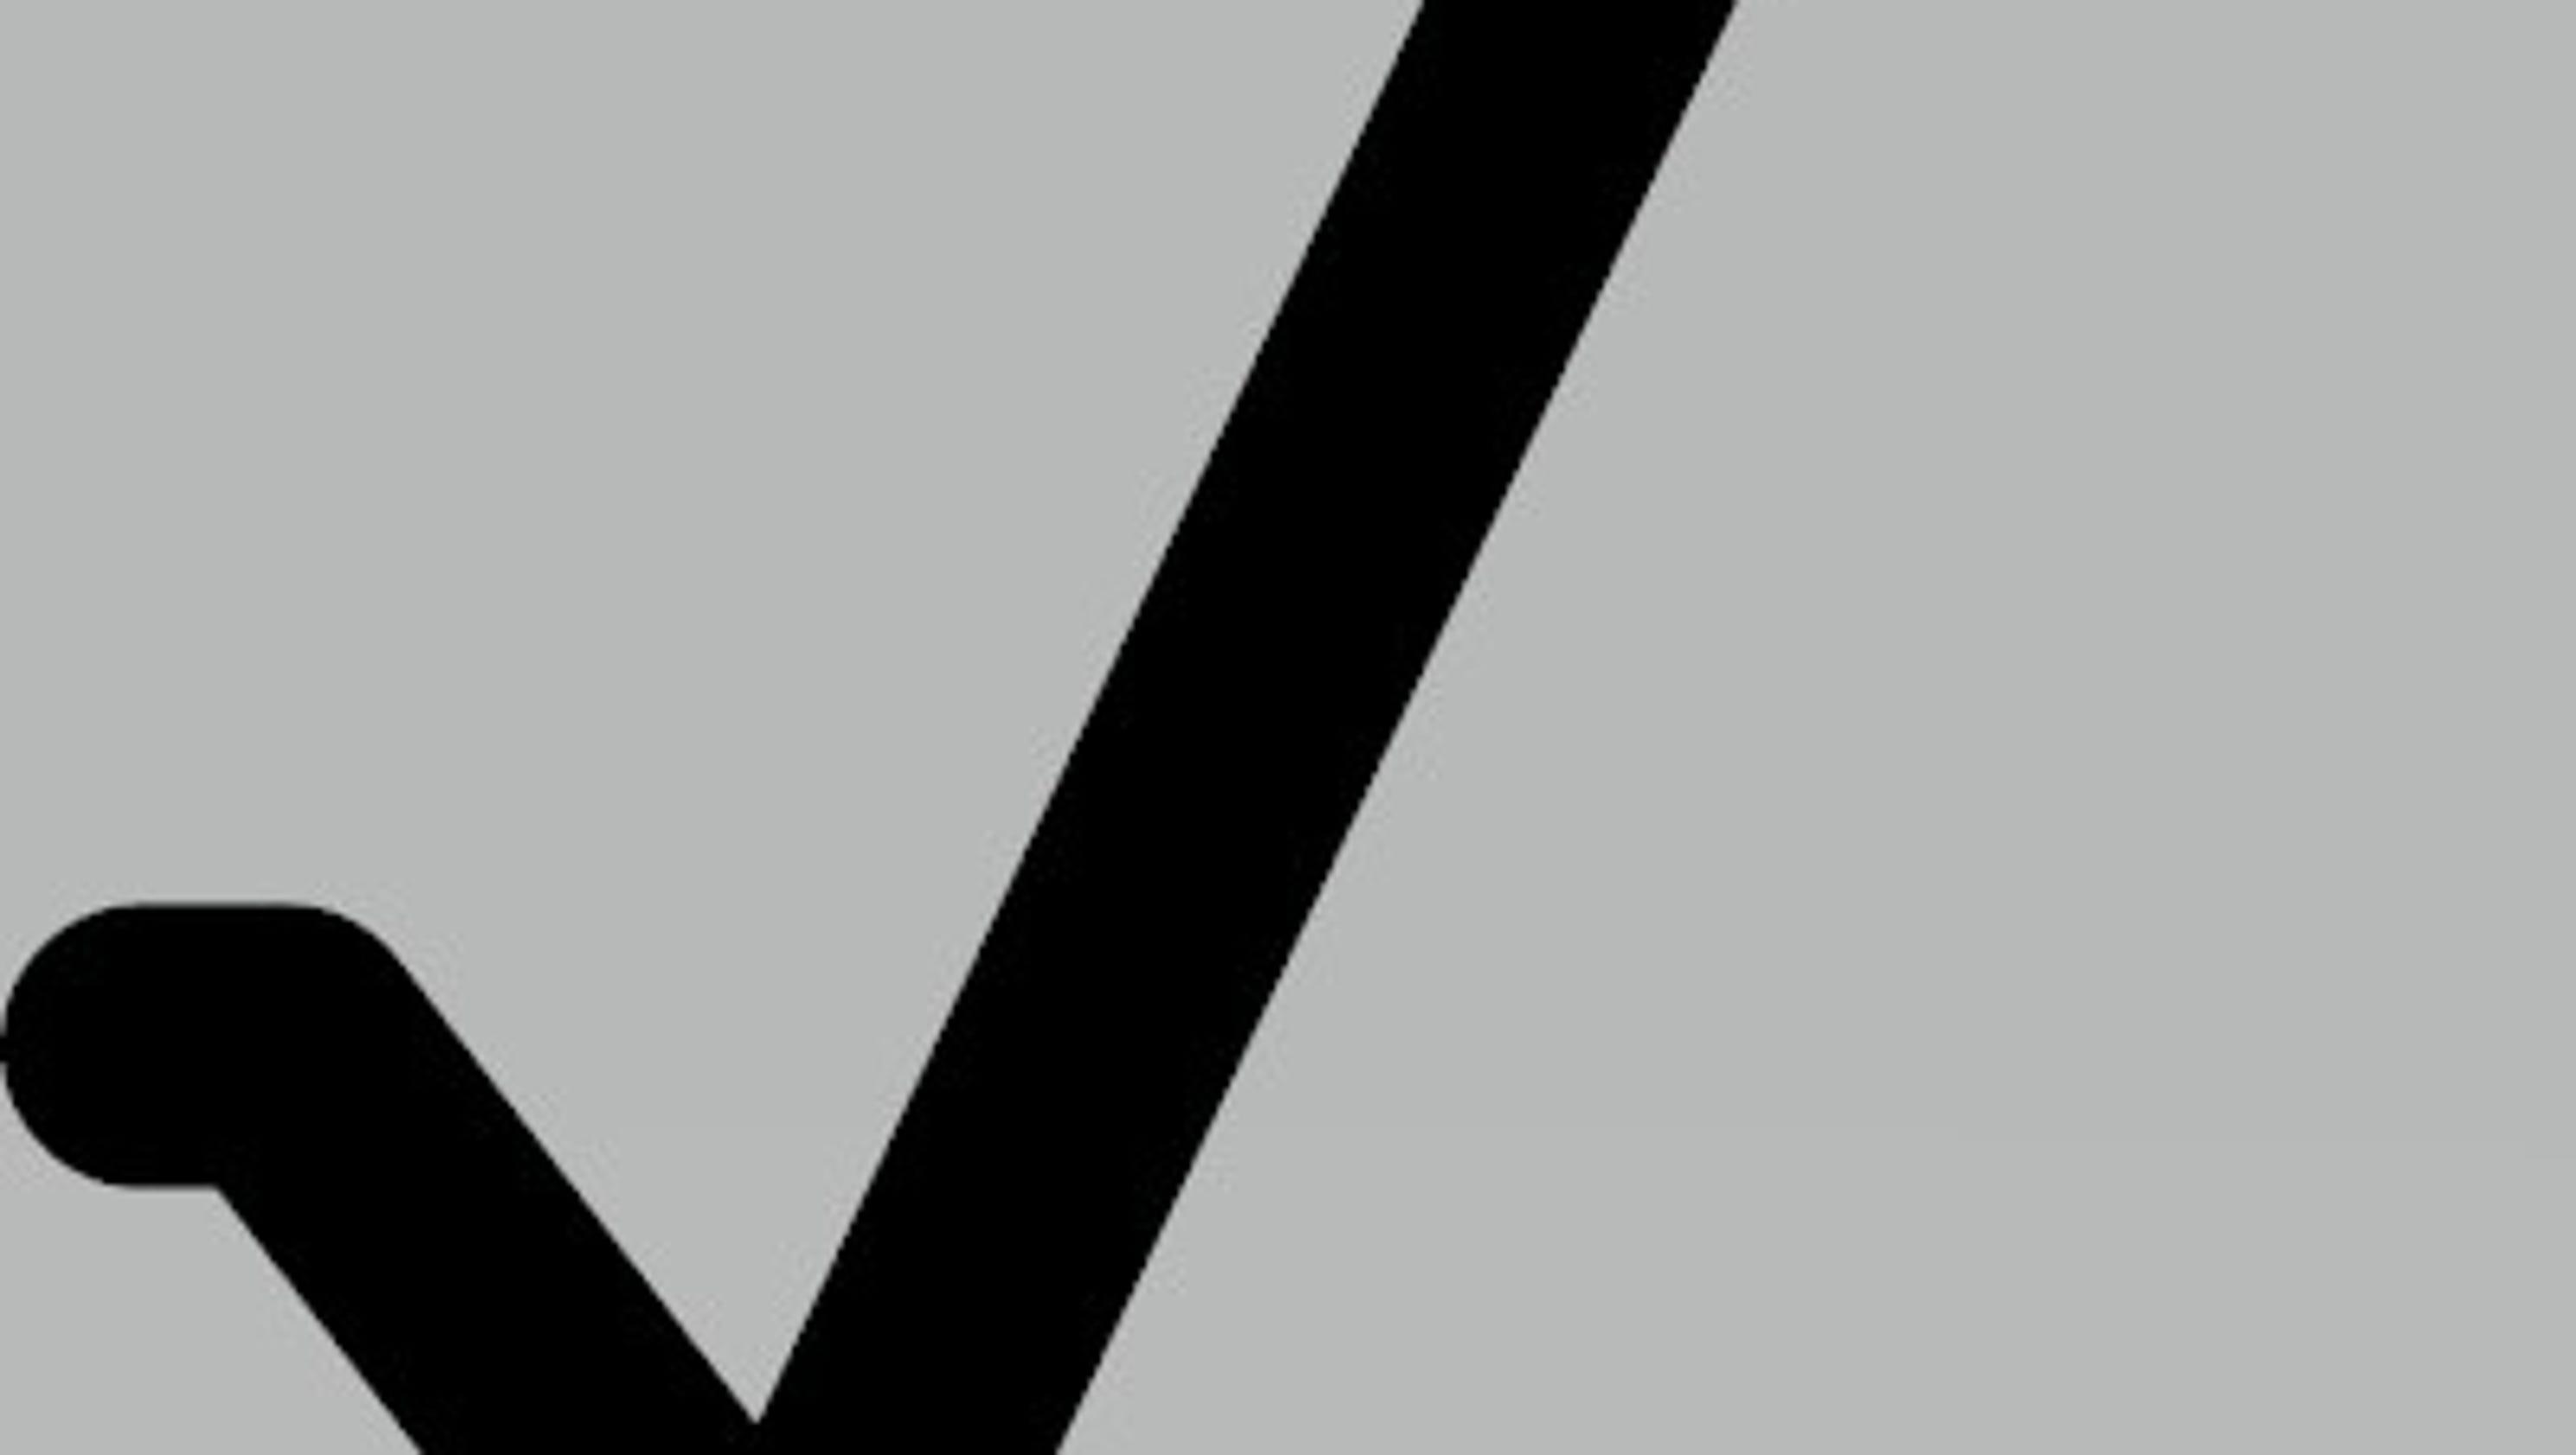 Math symbol sparks police search for gun in allen parish buycottarizona Images